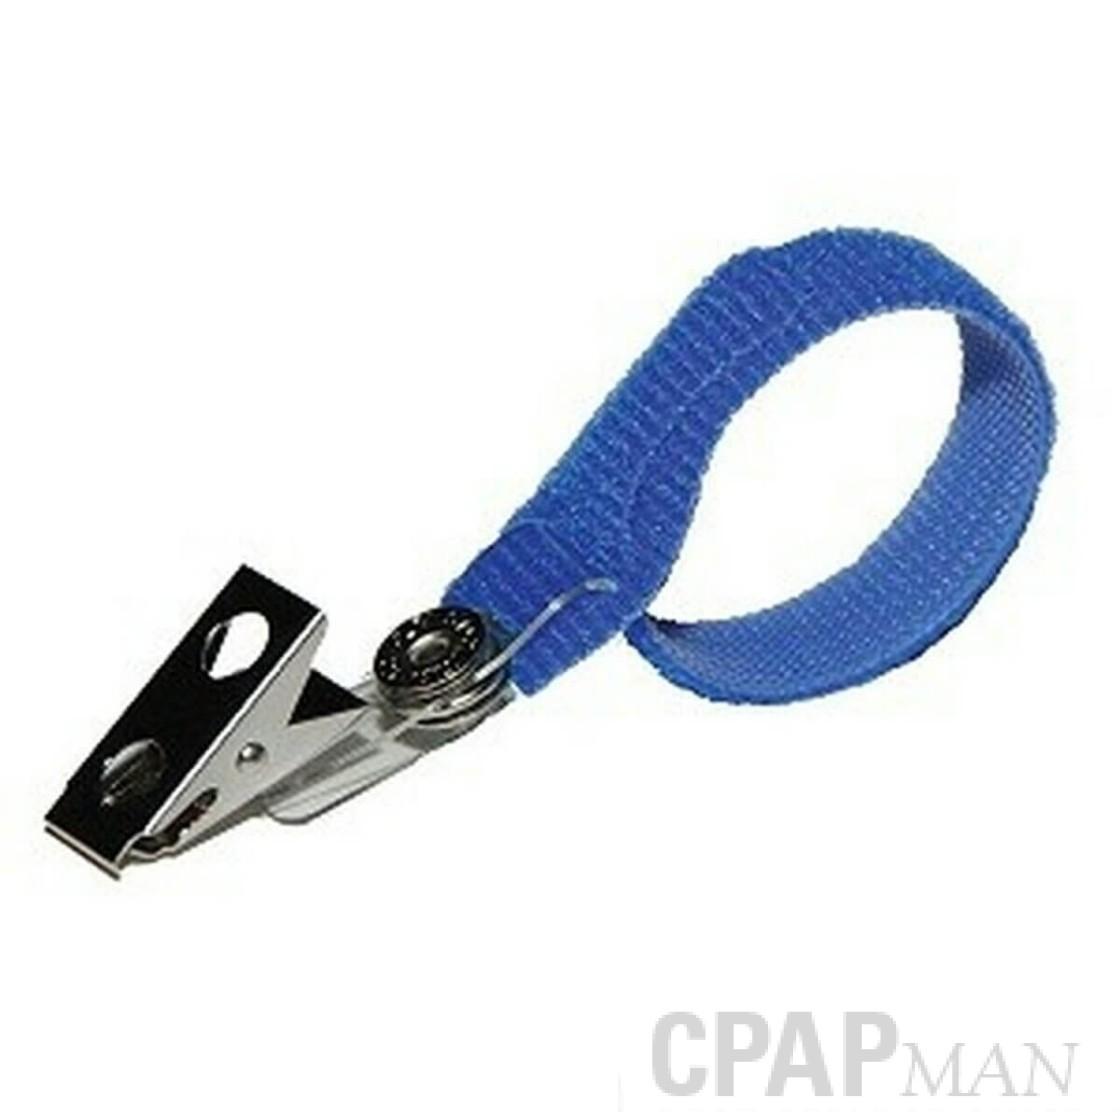 SleepWeaver Advance CPAP Hose Clip - Circadiance